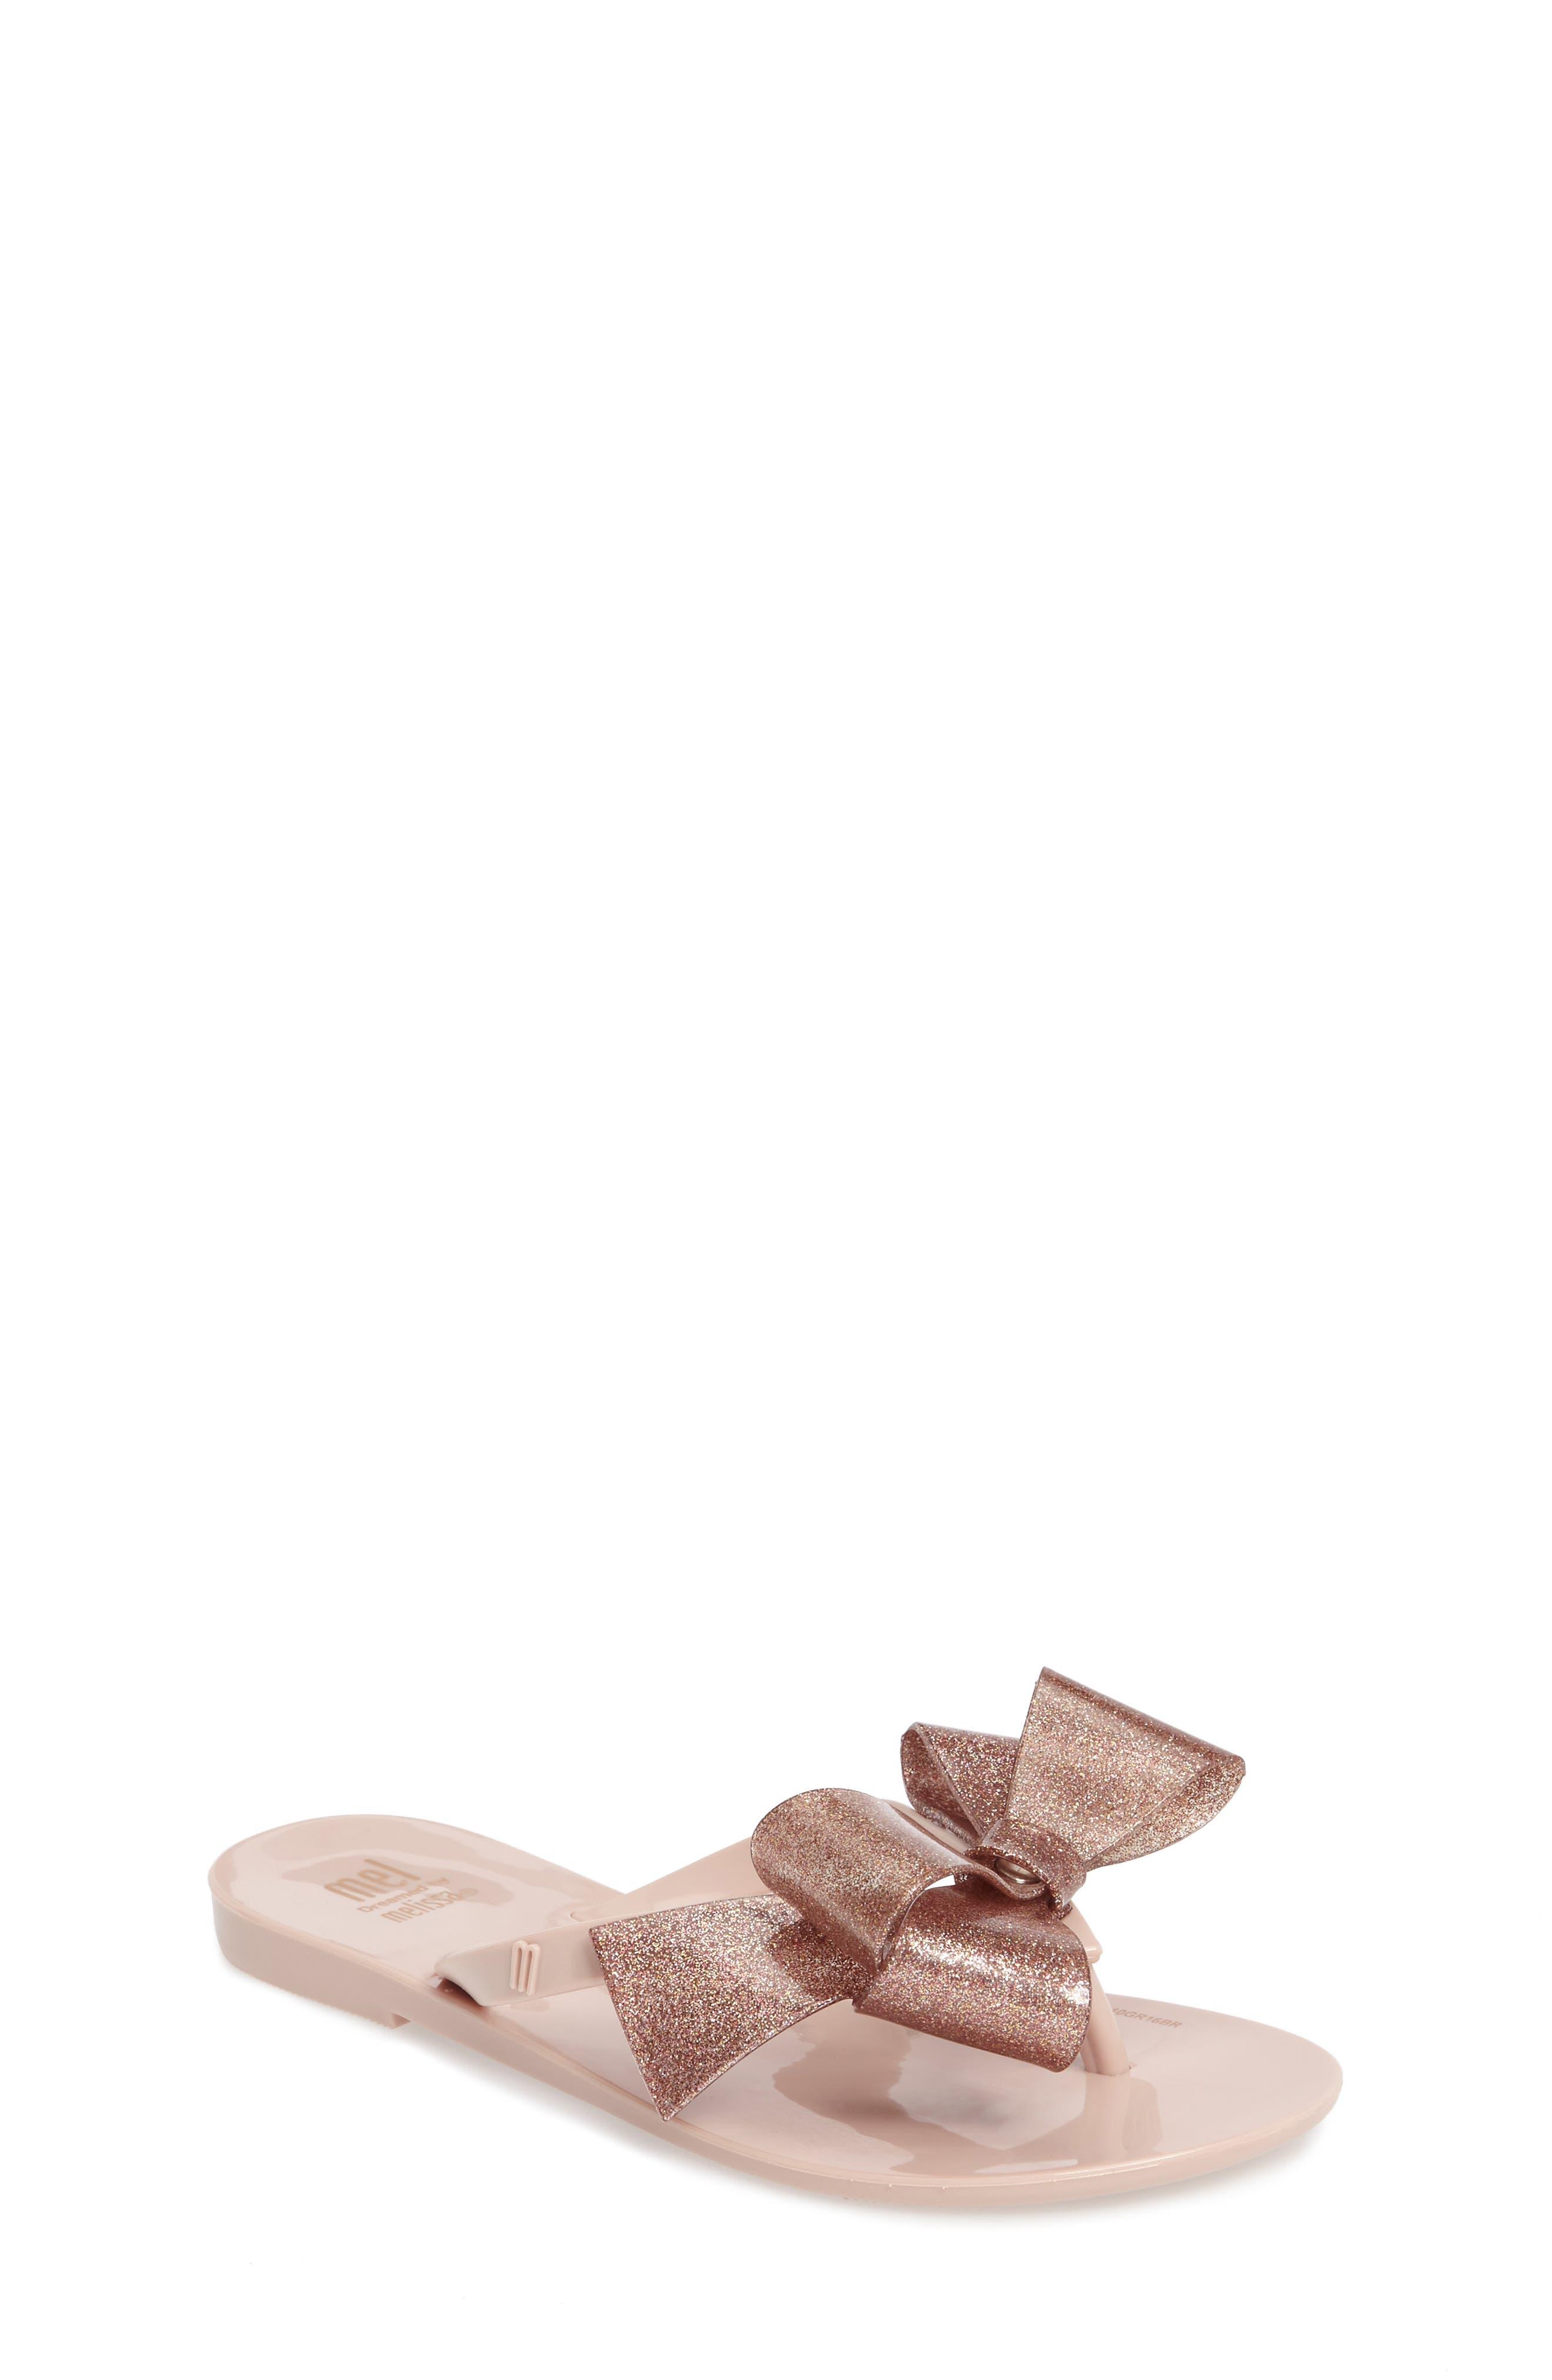 Harmonic Bow III Sandal,                         Main,                         color, SAND